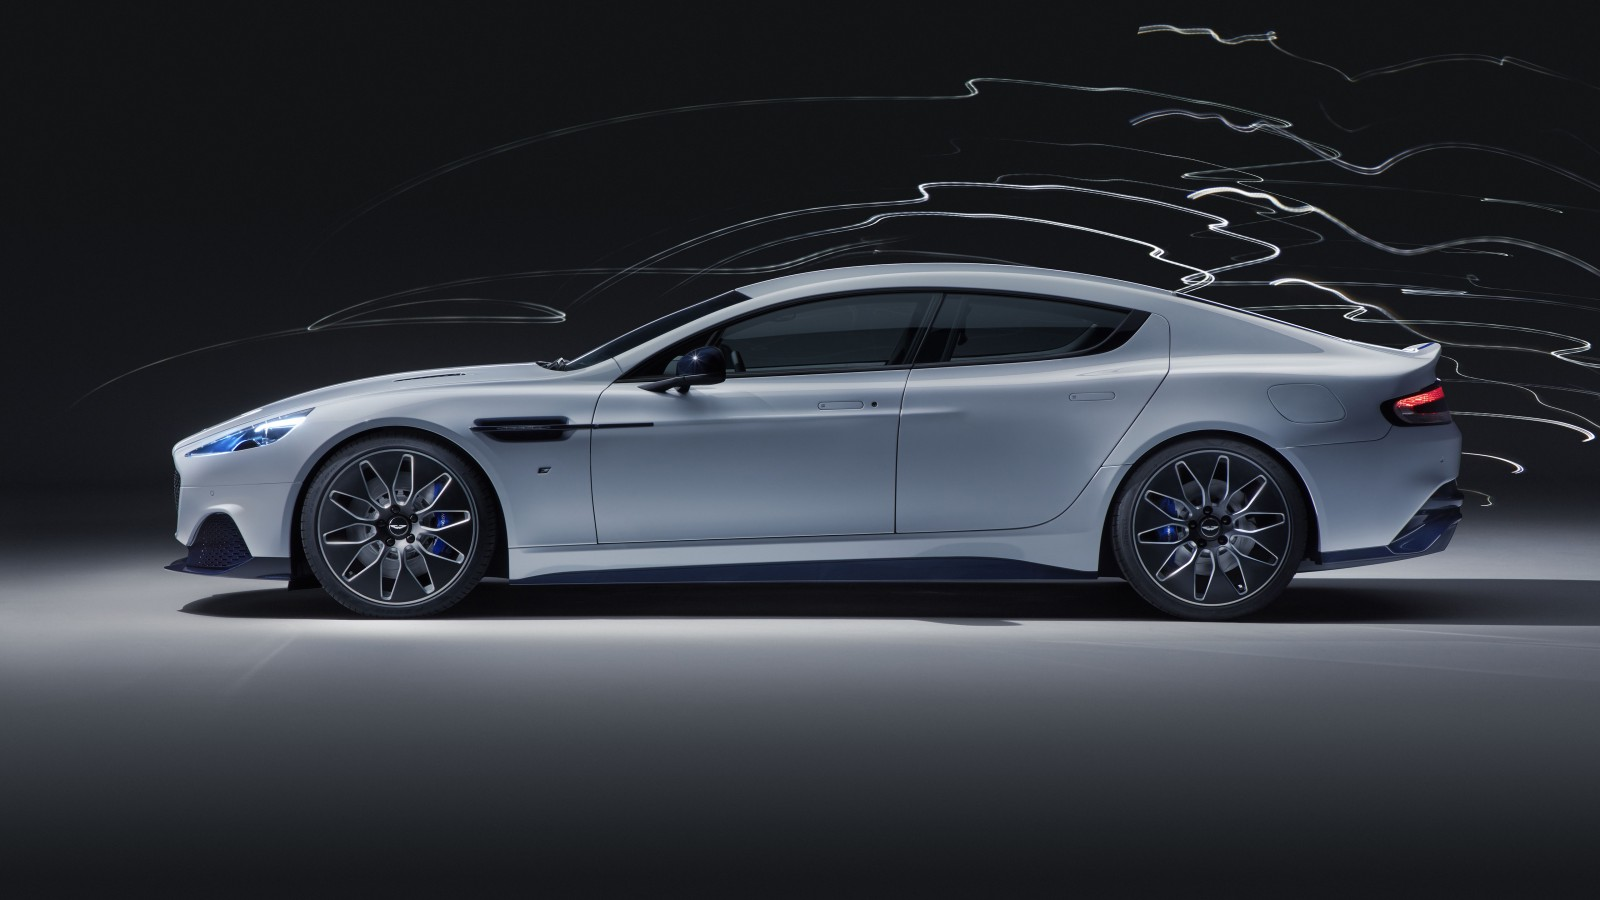 Aston Martin Rapide E 2019 5K 3 Wallpaper | HD Car ...